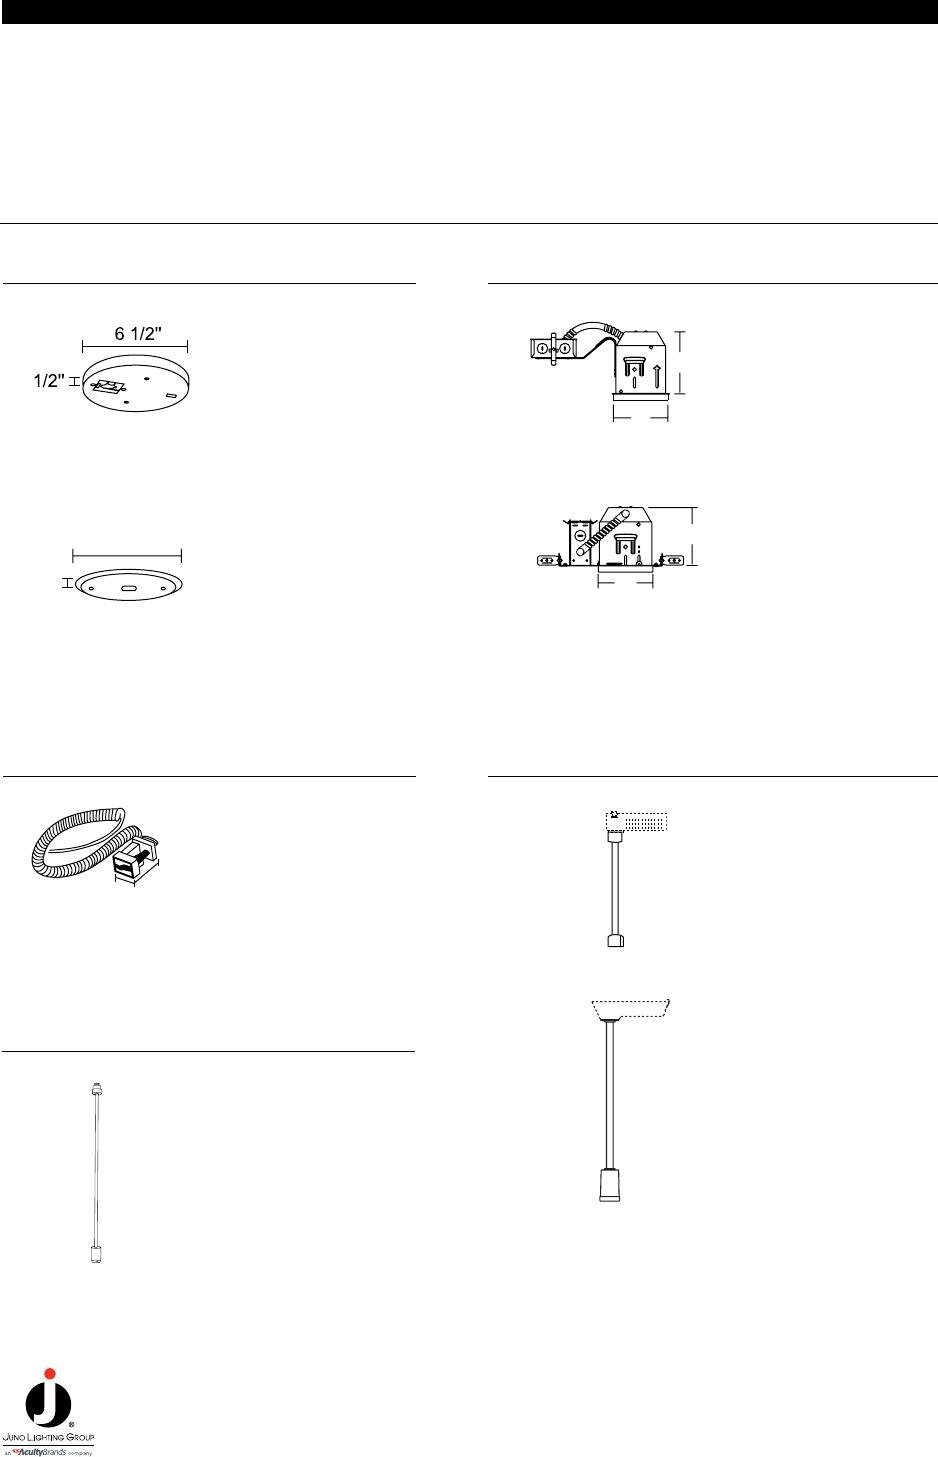 [SCHEMATICS_48DE]  Product Detail Manual | Juno Transformer Wiring Diagram |  | UserManual.wiki